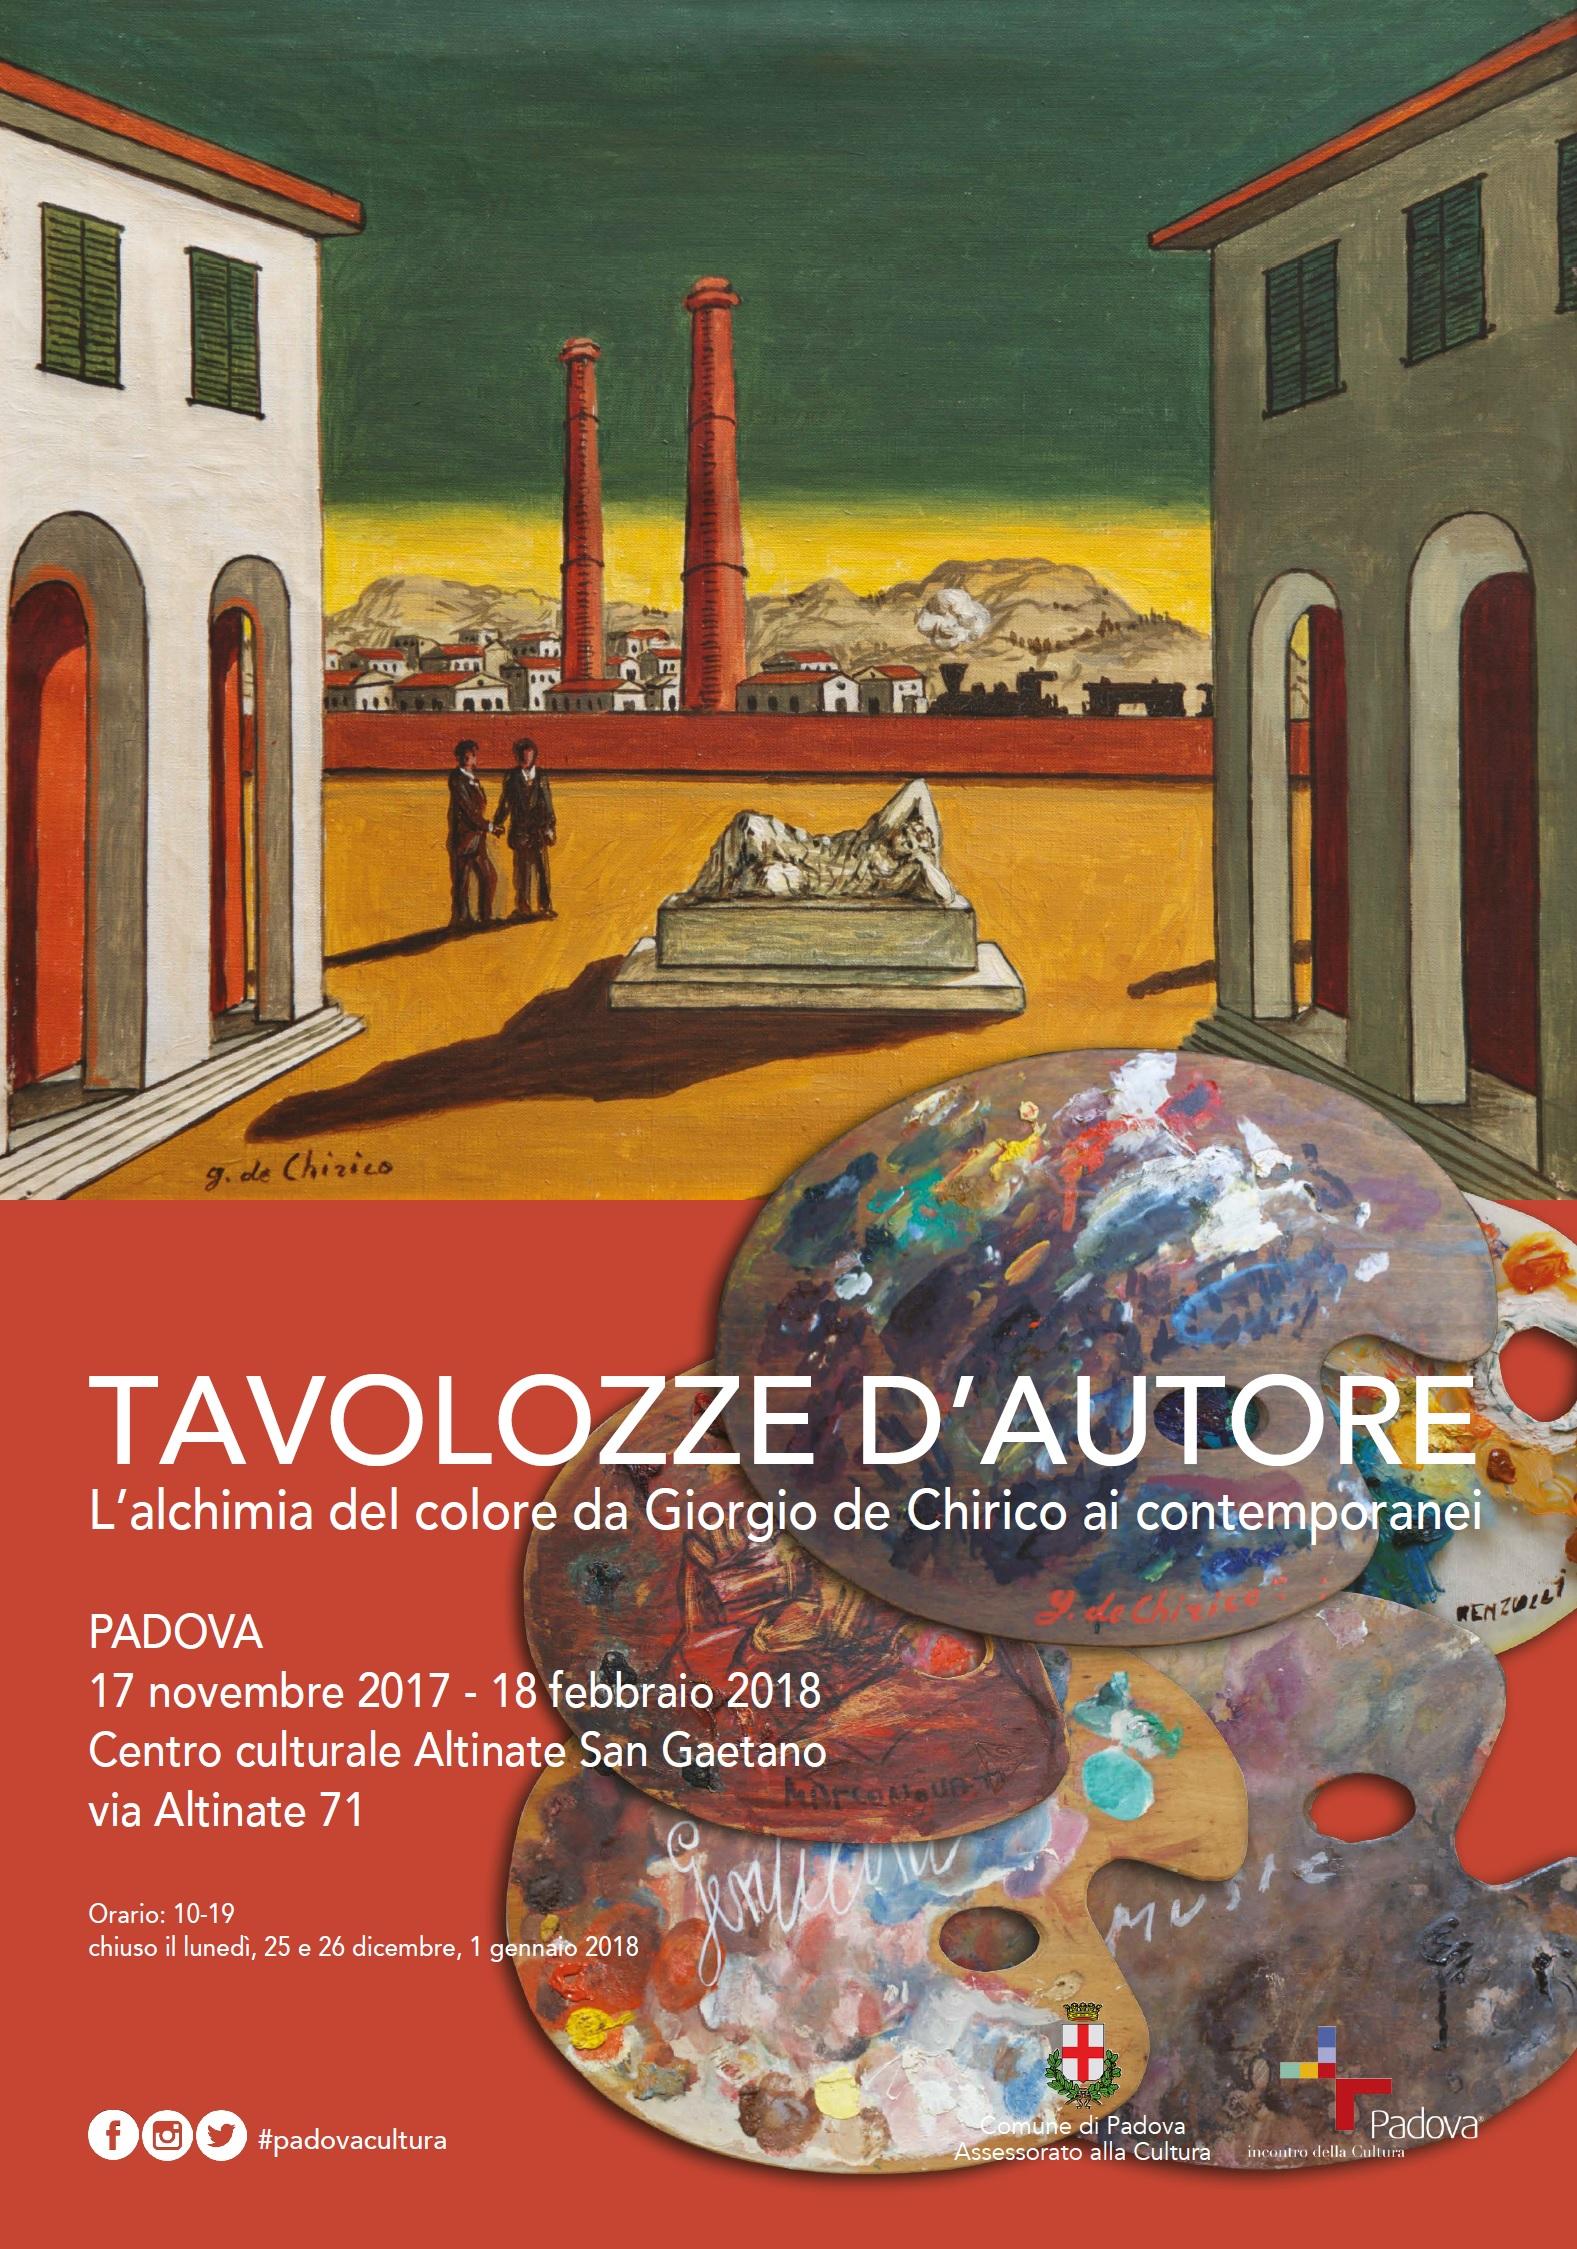 Favorito Tavolozze d'autore   Padova Cultura AJ33